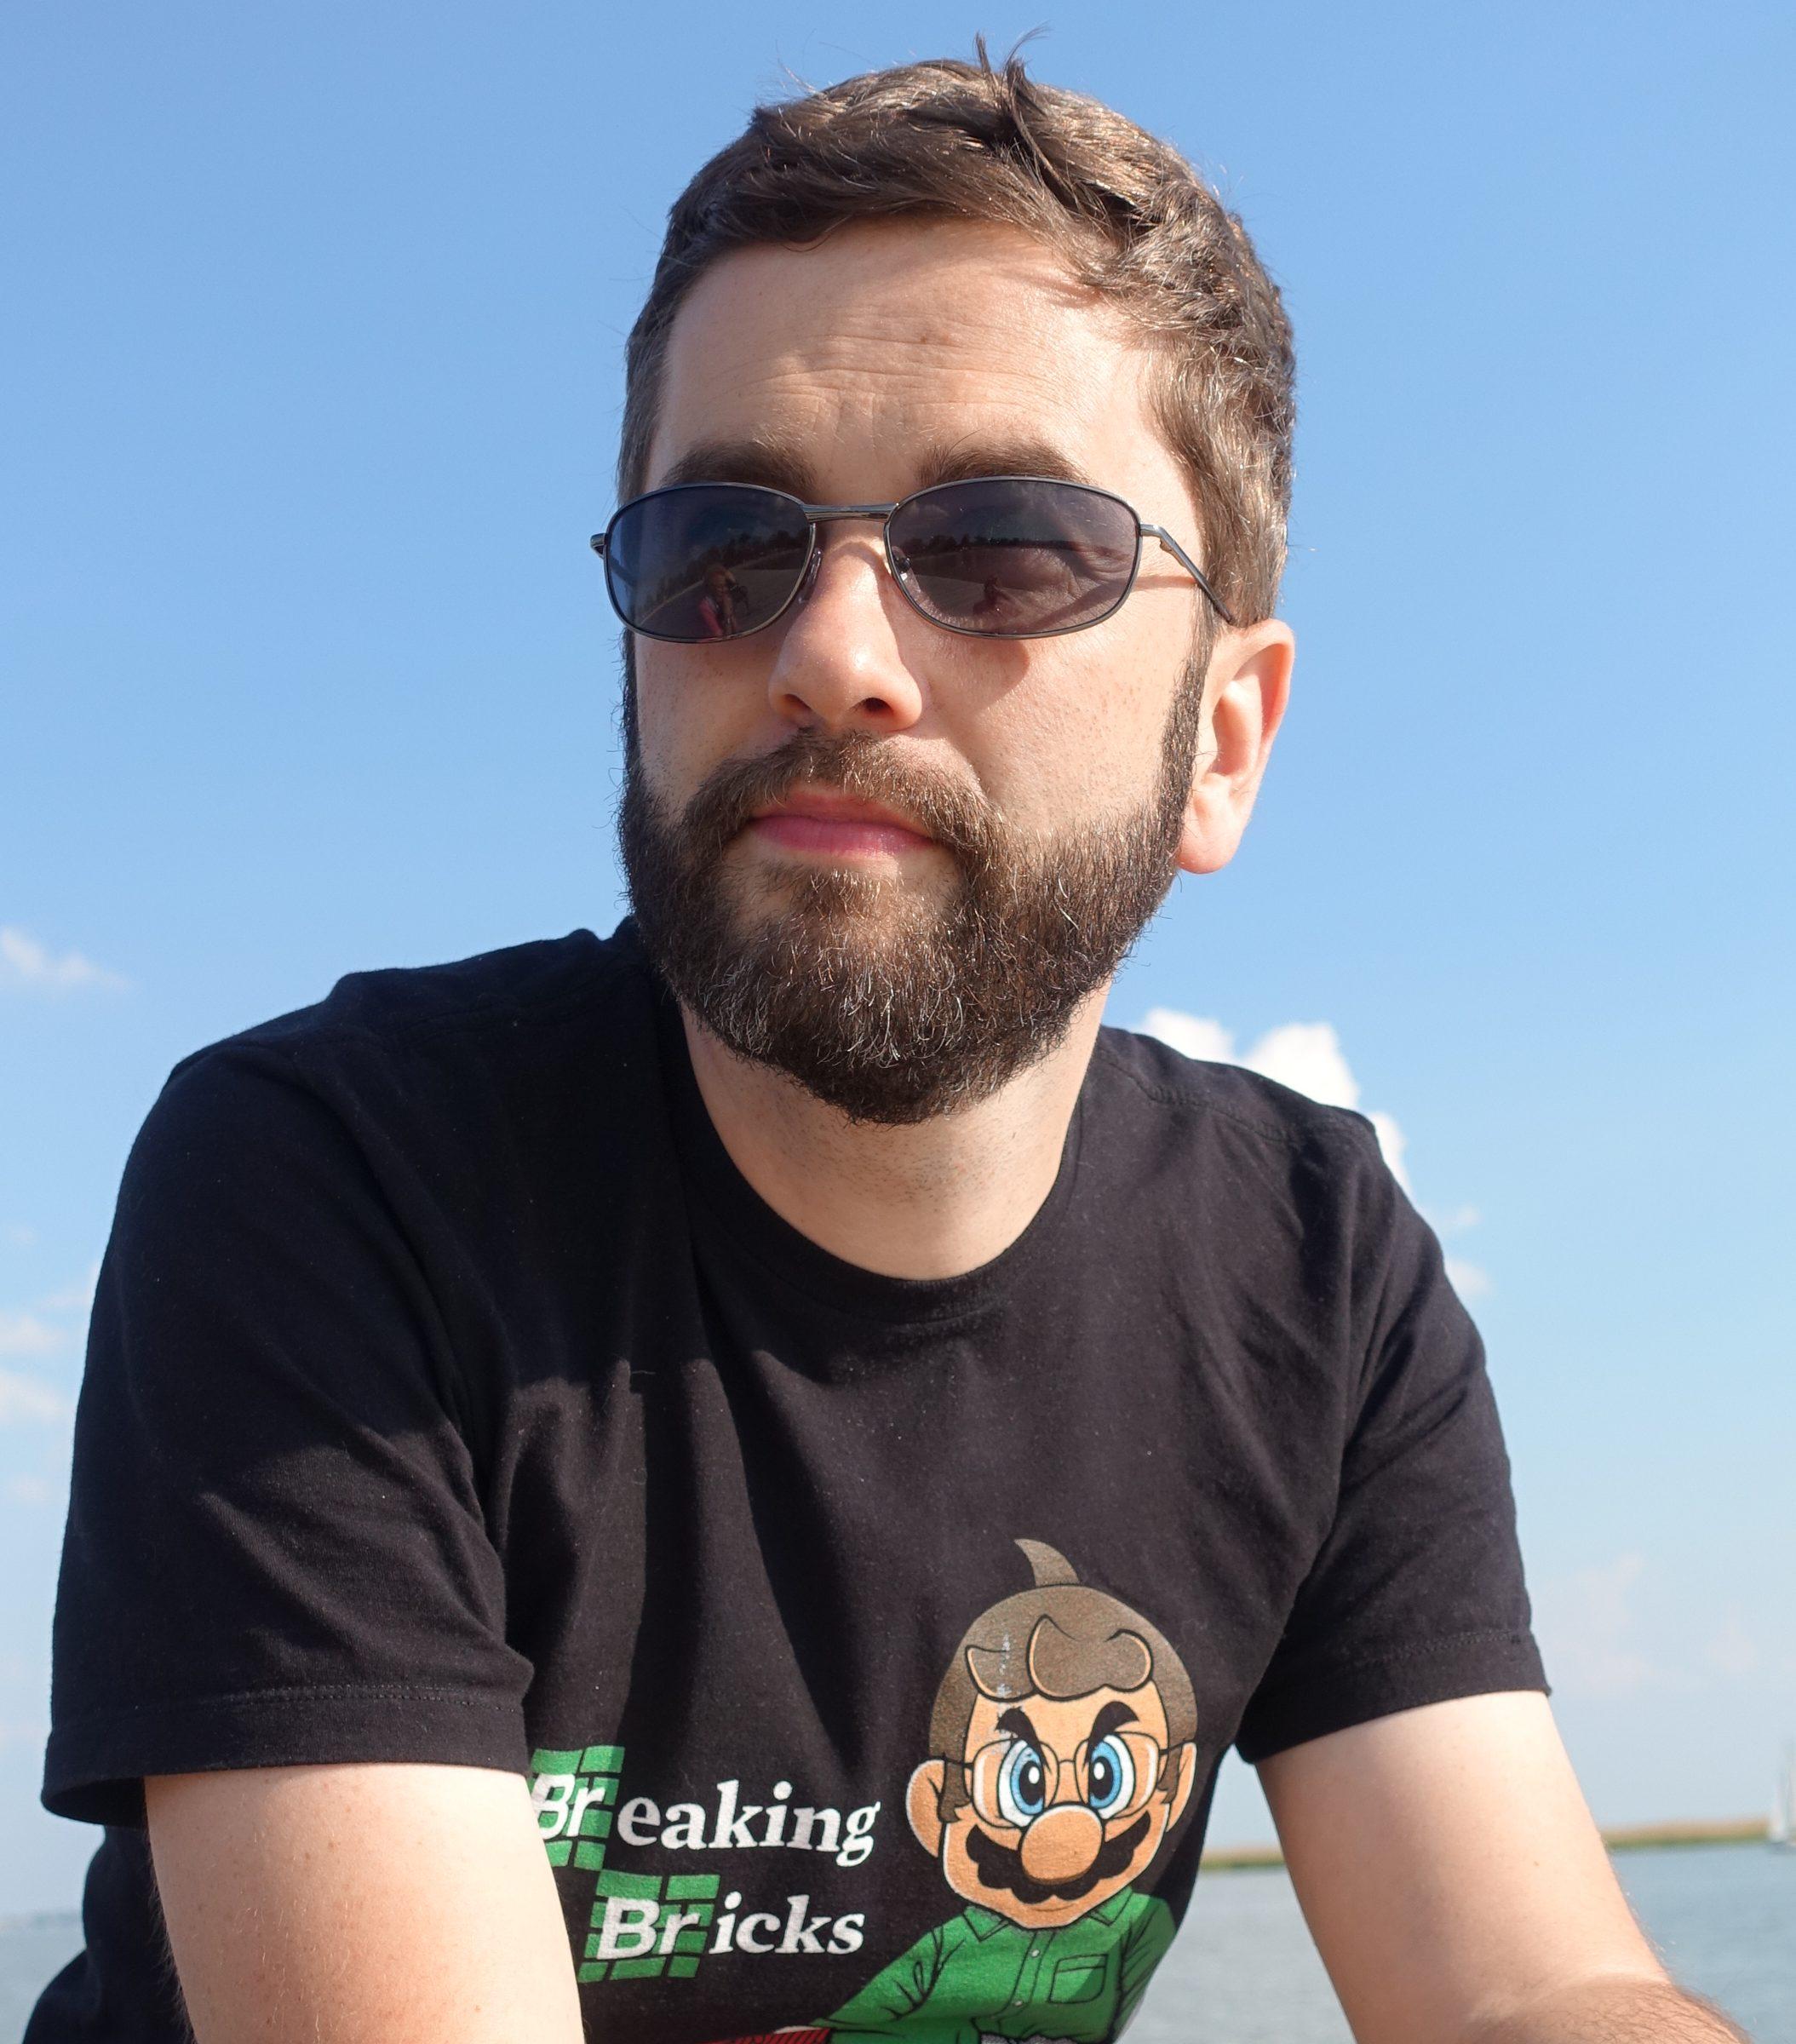 Wolfgang Hoi: Blogger, Zeilenmacher und Geschichtendenker.